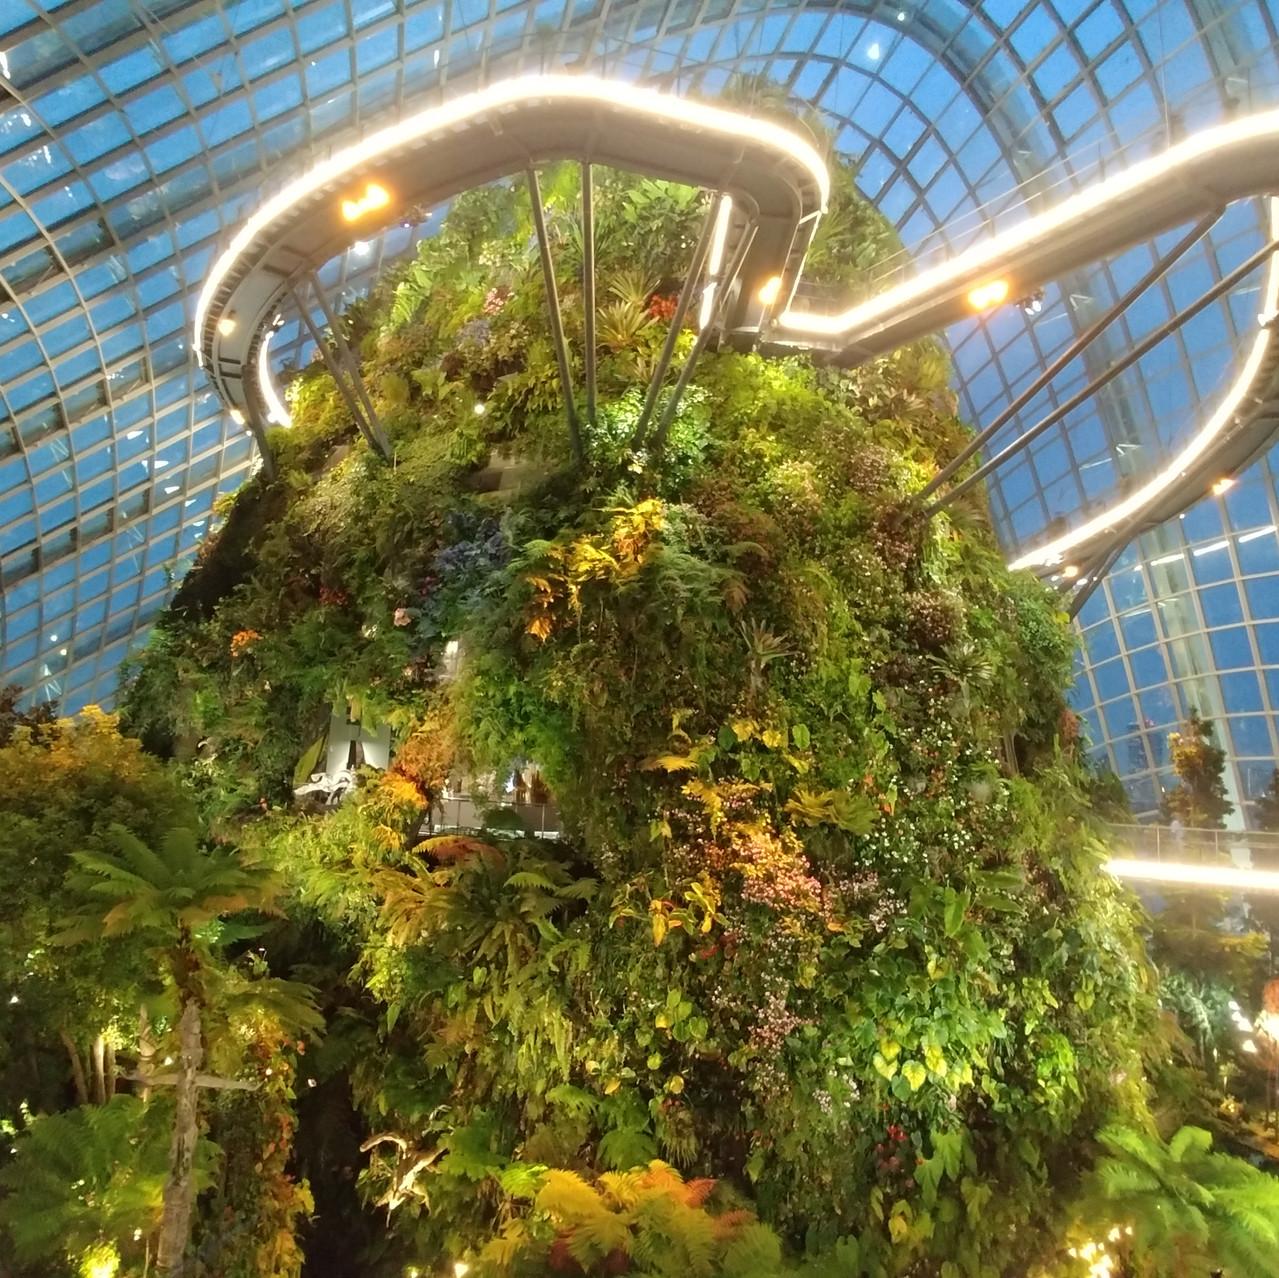 Jardin botanique futuriste